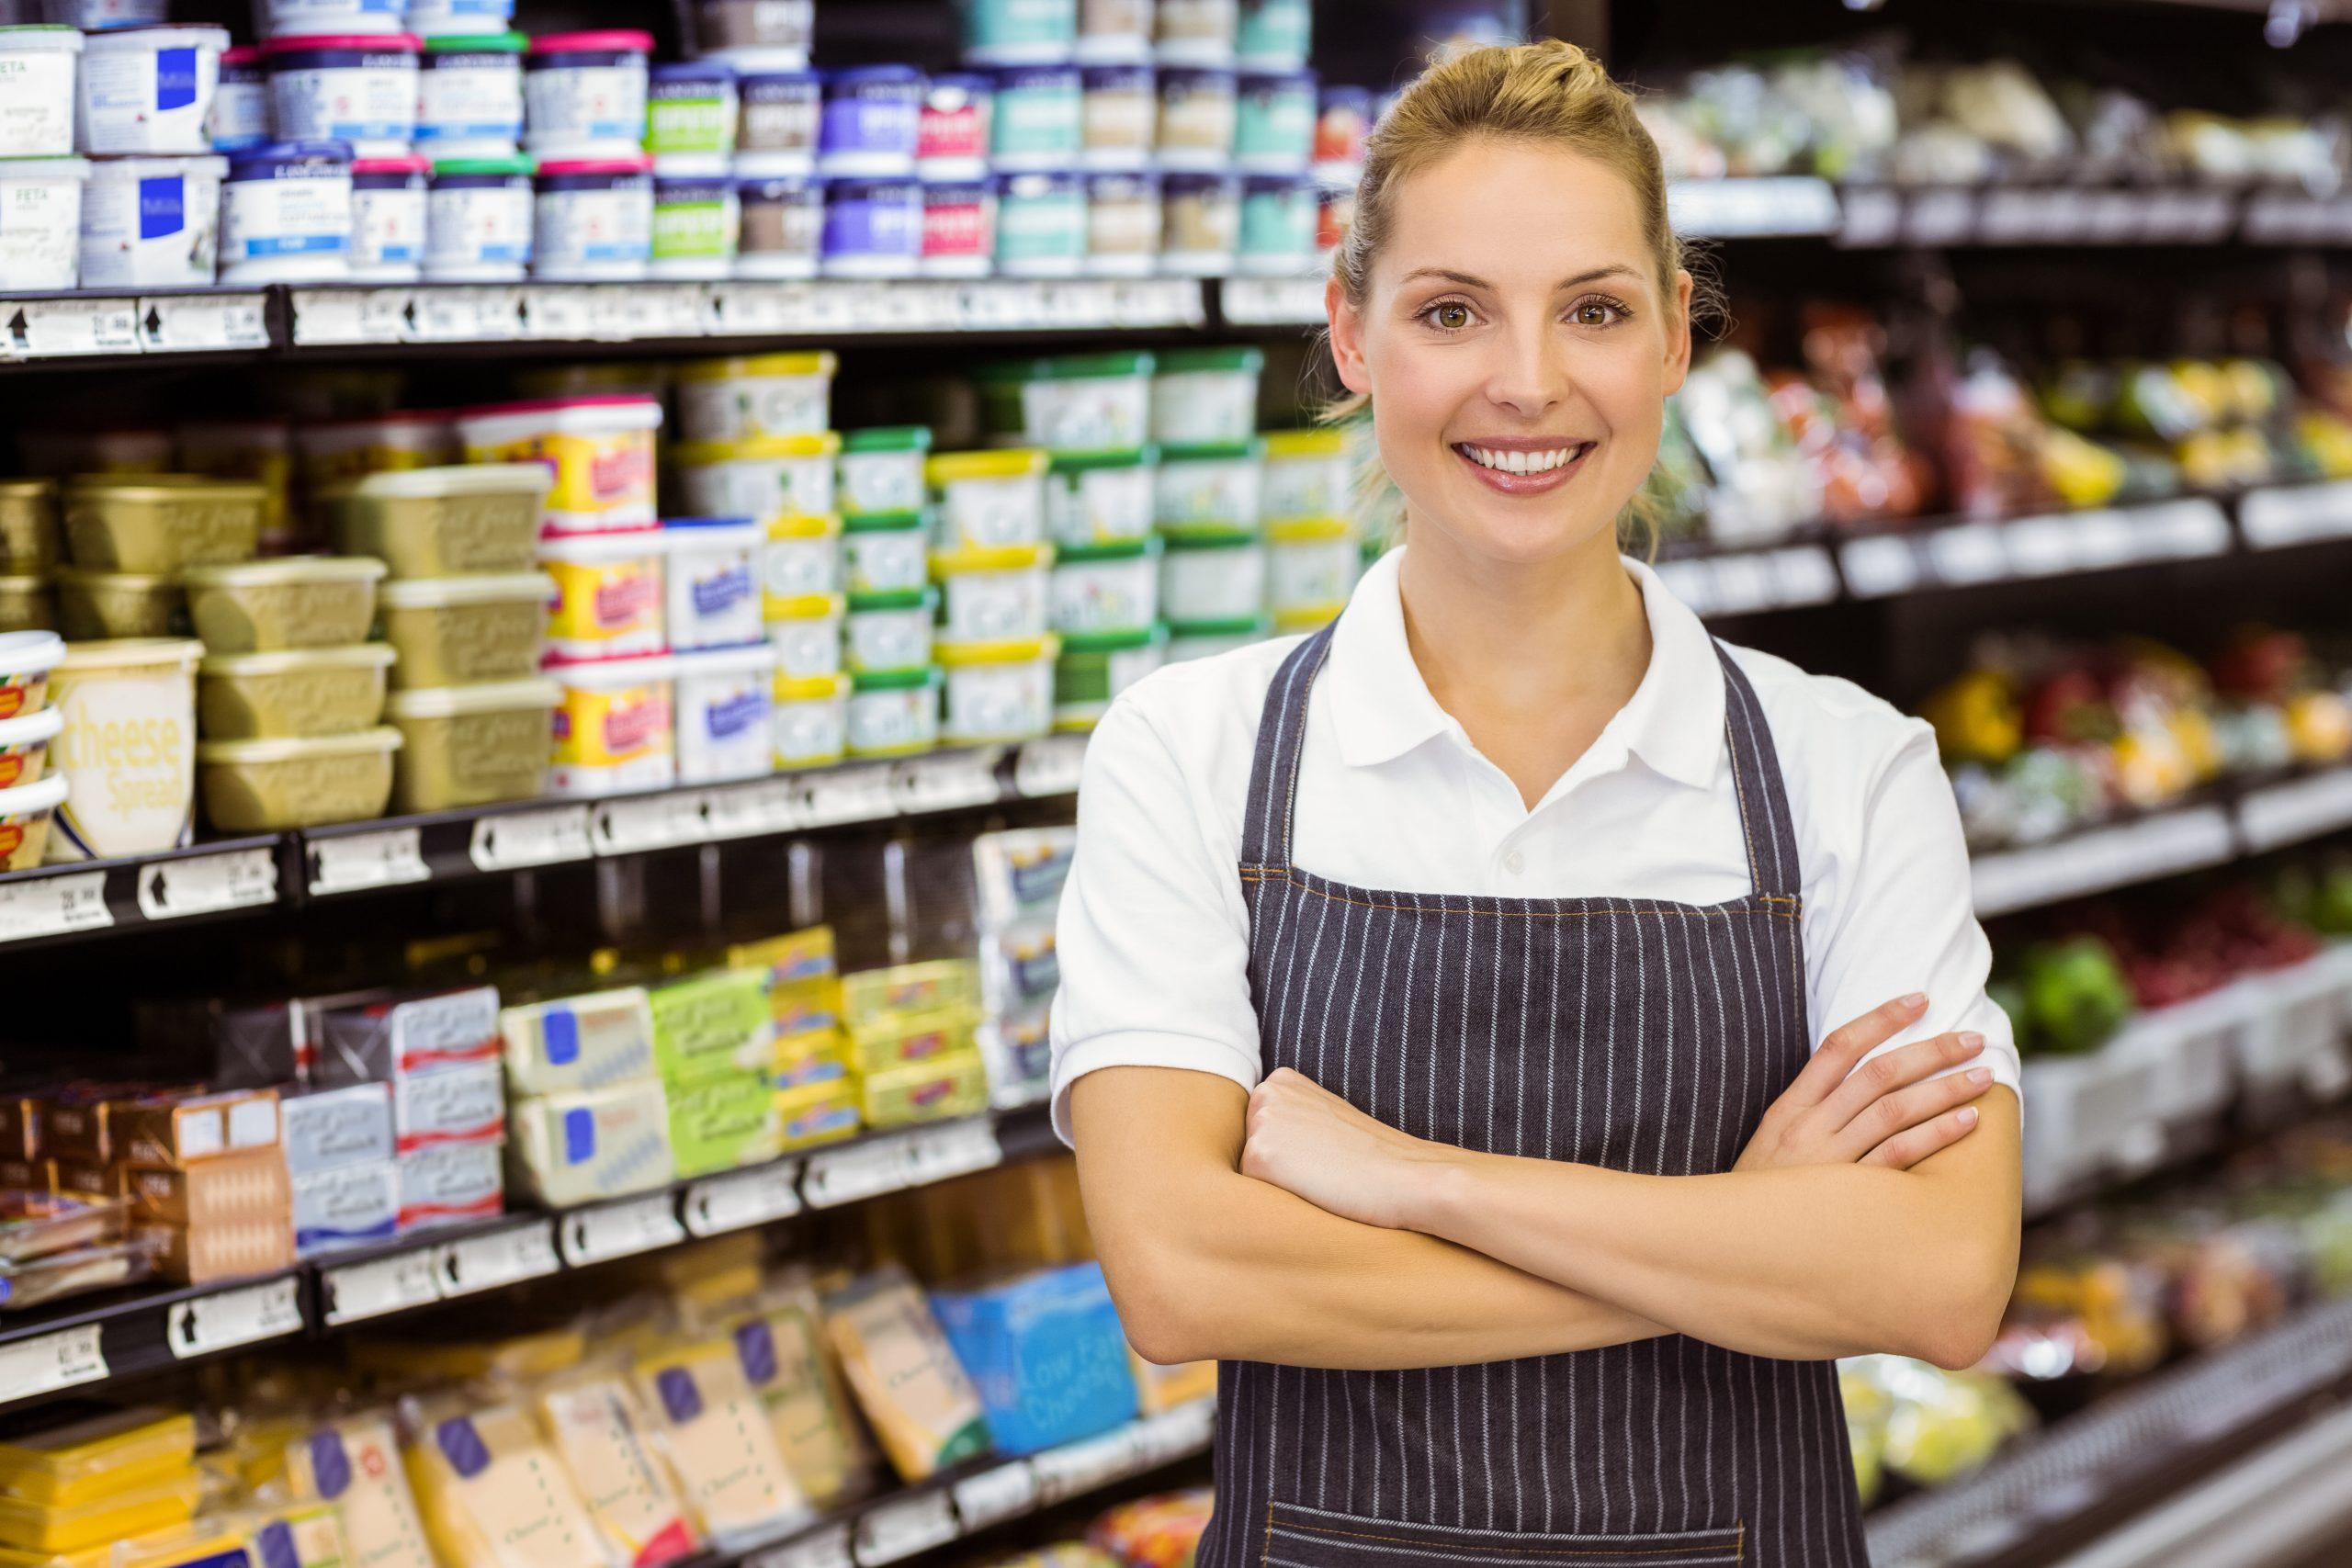 Prekyba maisto prekėmis